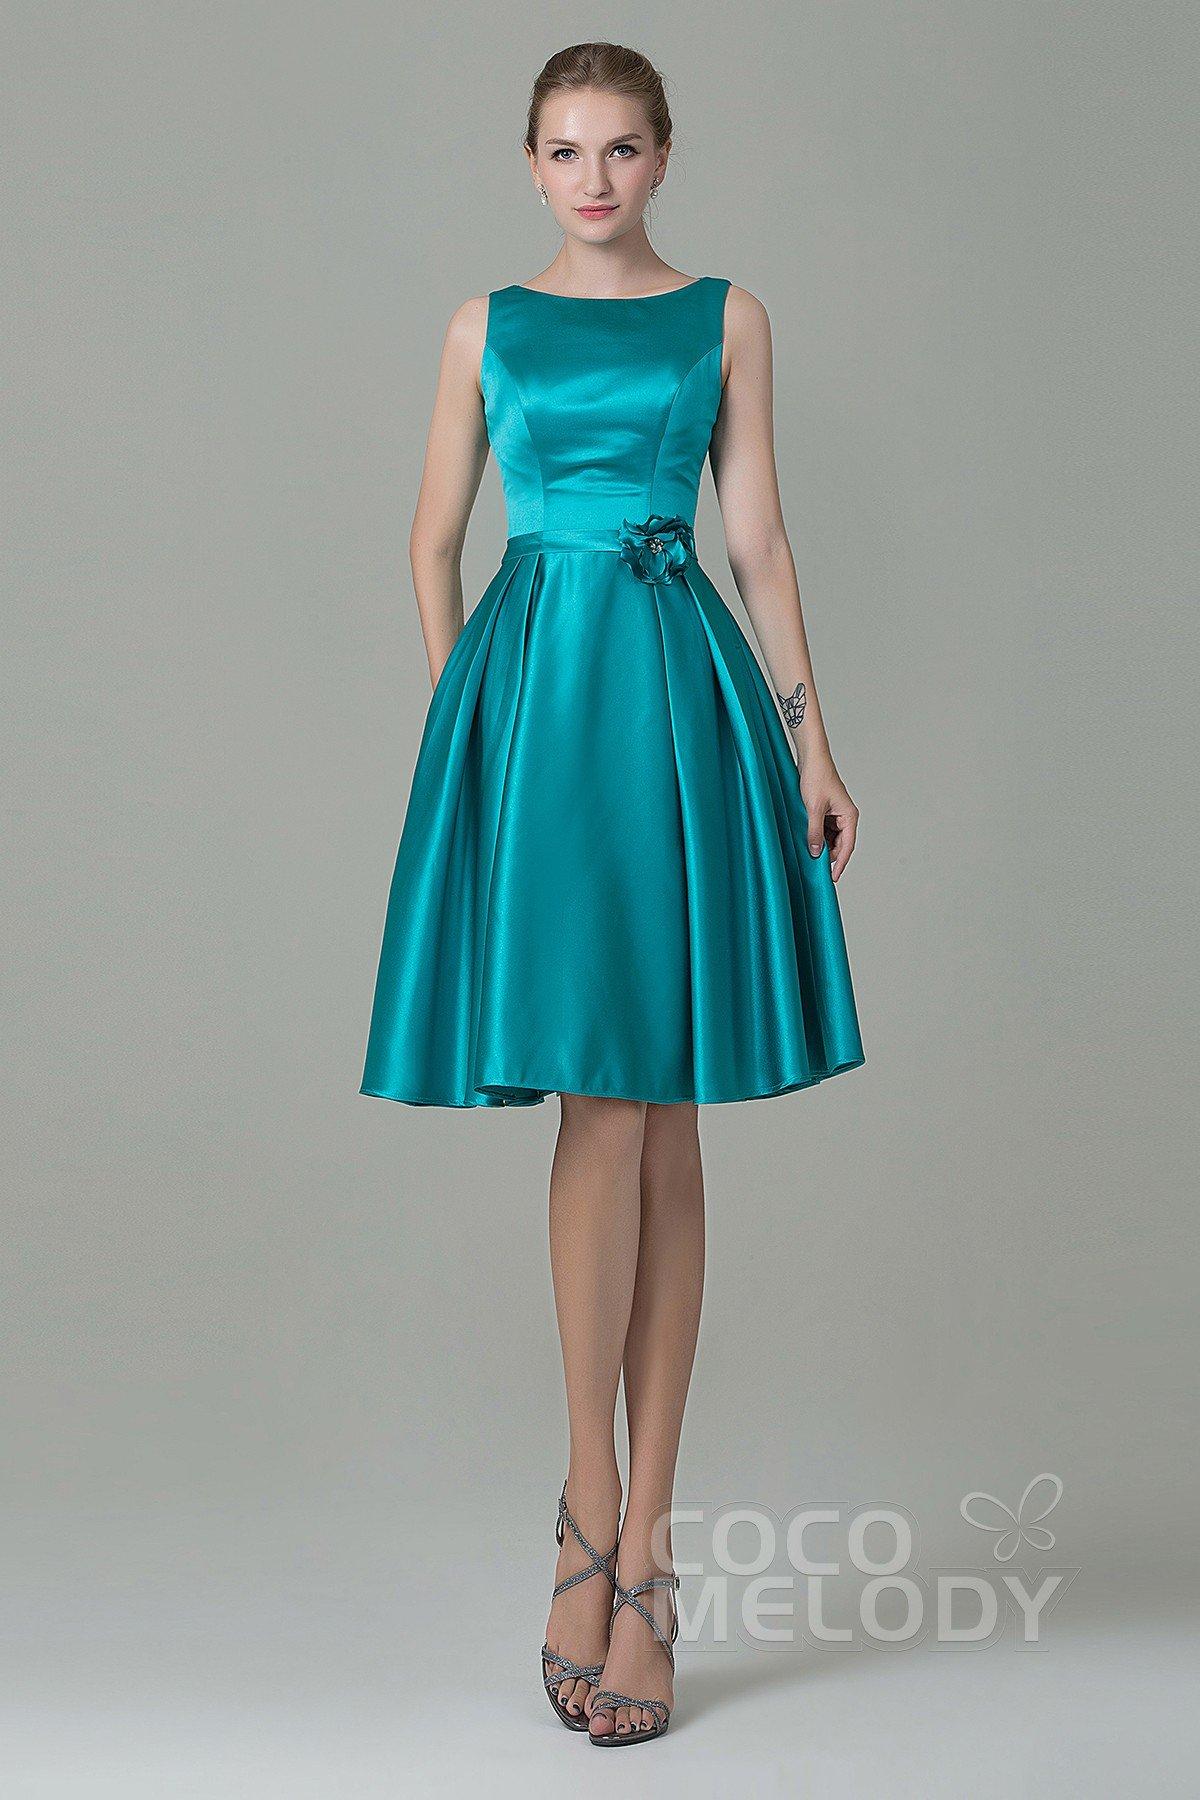 Pretty A-Line Bateau Natural Knee Length Satin Blue Turquoise Sleeveless Zipper Bridesmaid Dress with Flower COZK1500B